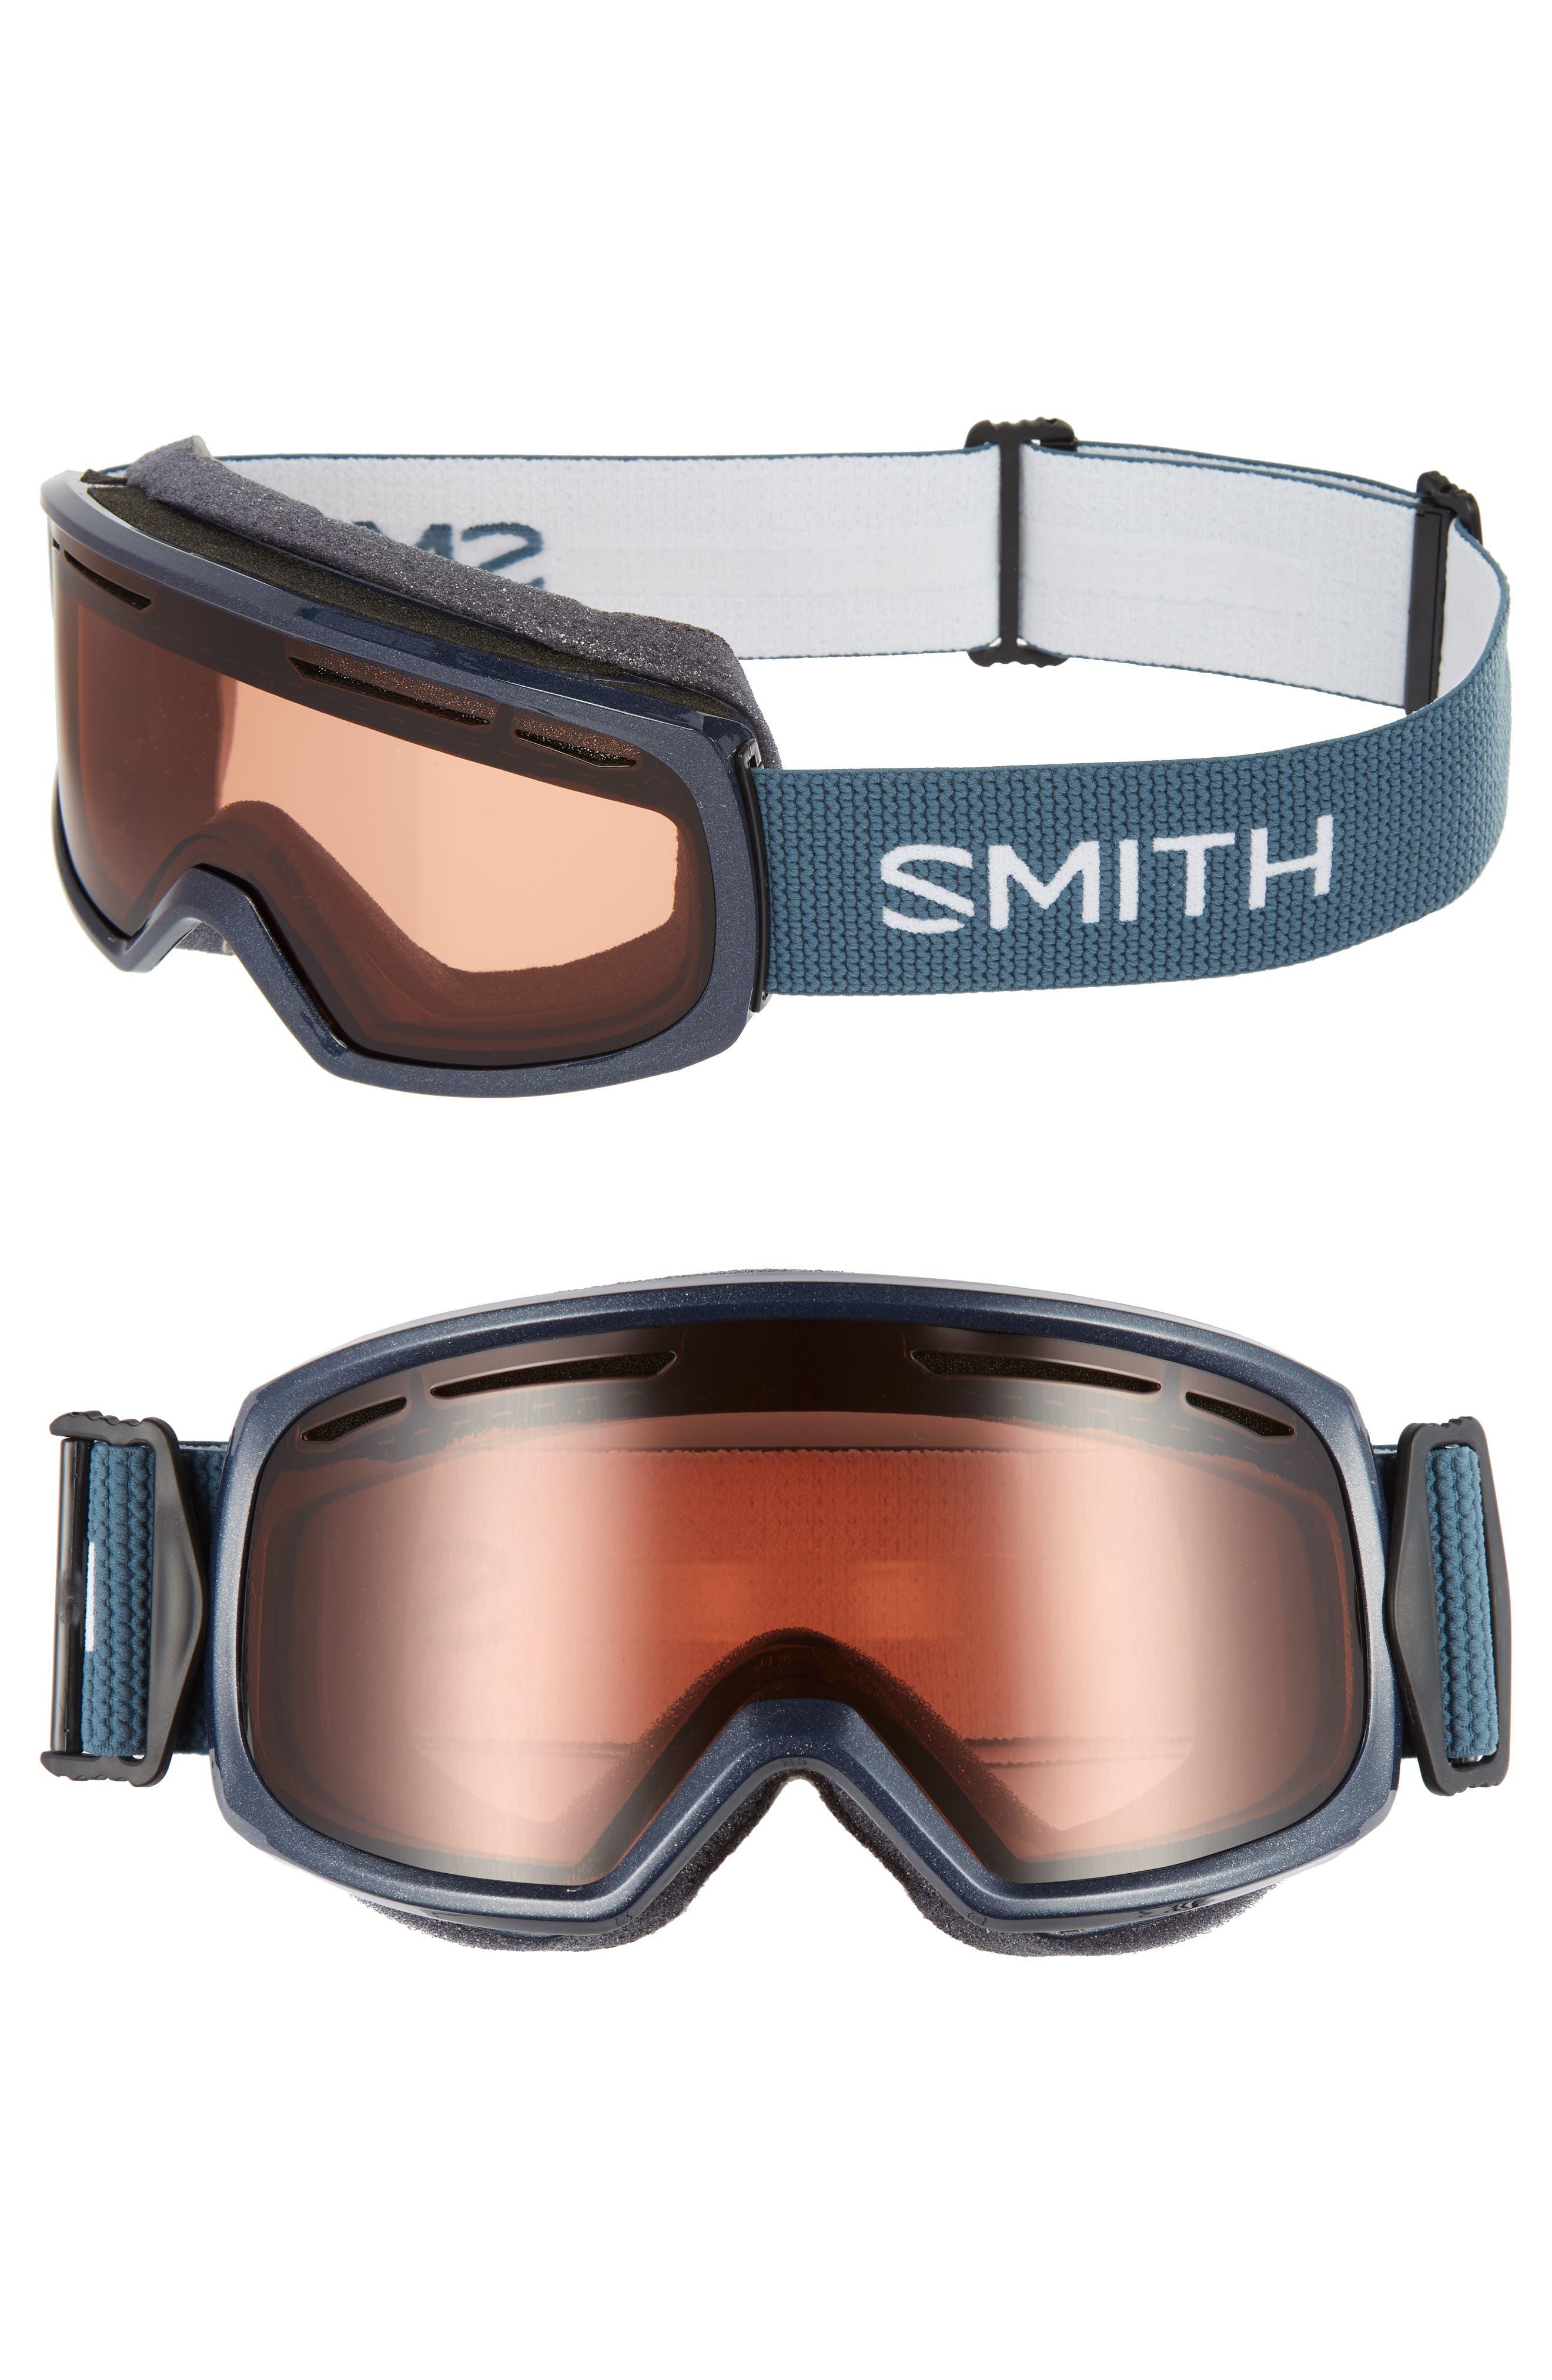 bd1a9e80758 Smith Drift 180Mm Snow Goggles - Petrol